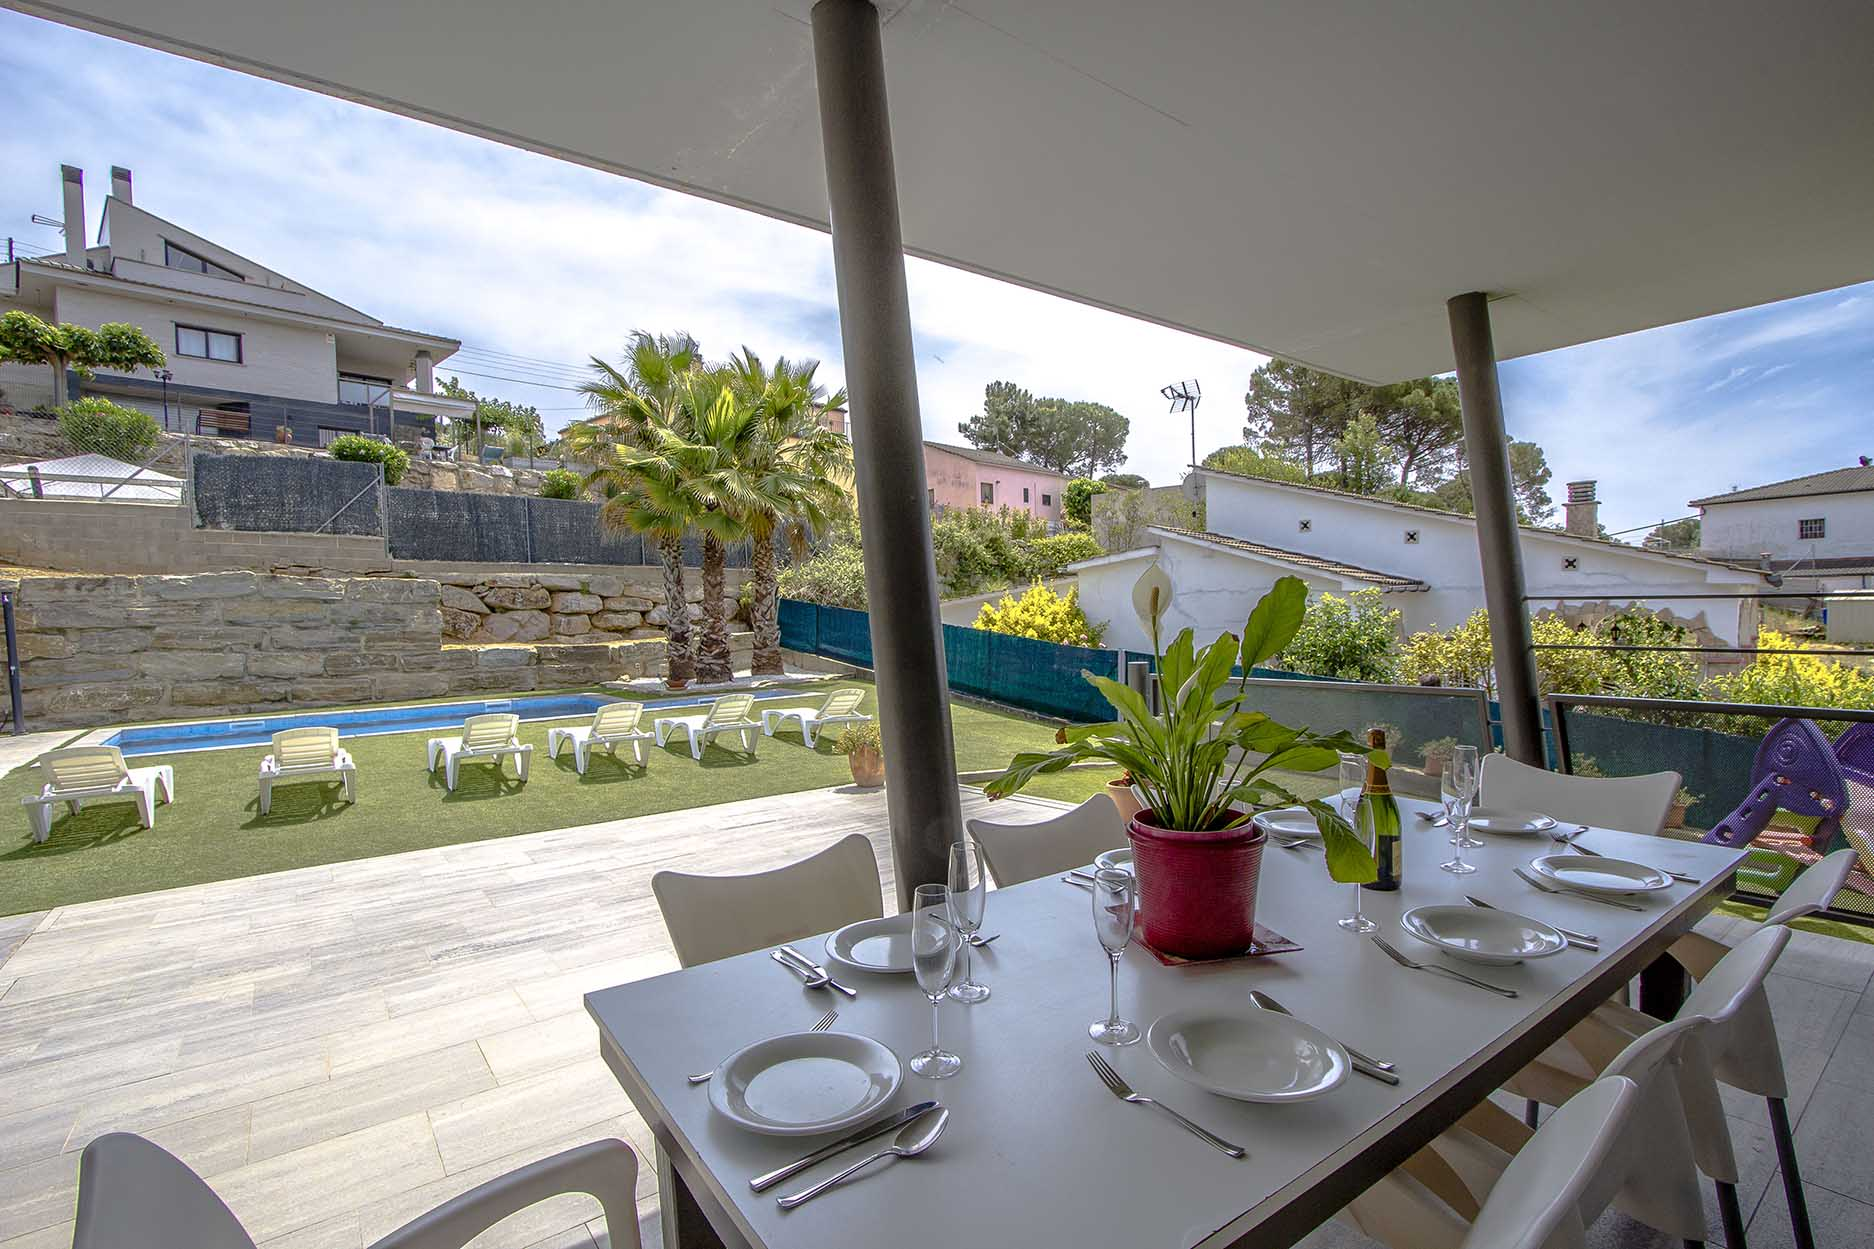 Ferienhaus Catalunya Casas: Modern villa in Sils, 15 min drive to Costa Brava beaches! (1902227), Les Mallorquines, Girona, Katalonien, Spanien, Bild 9